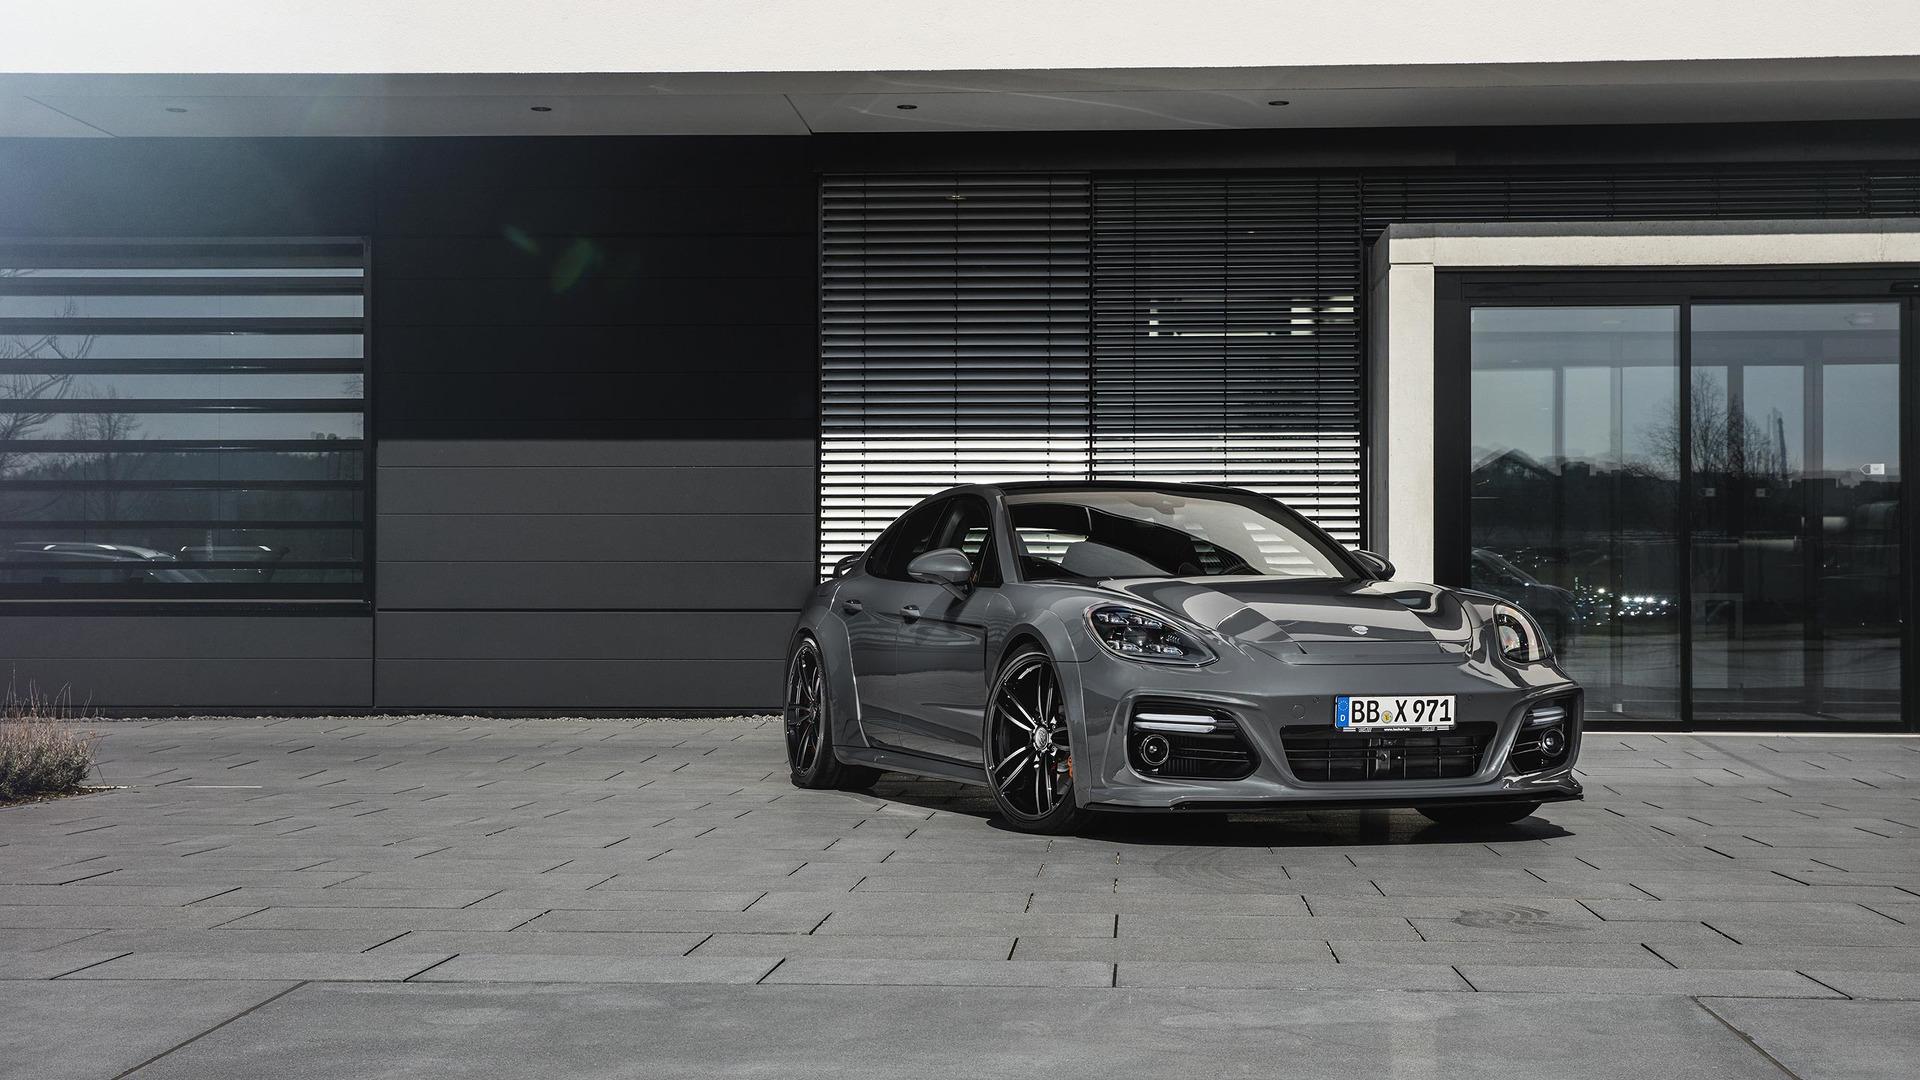 Techarts Porsche Panamera Kit Emphasizes Grand In Gt